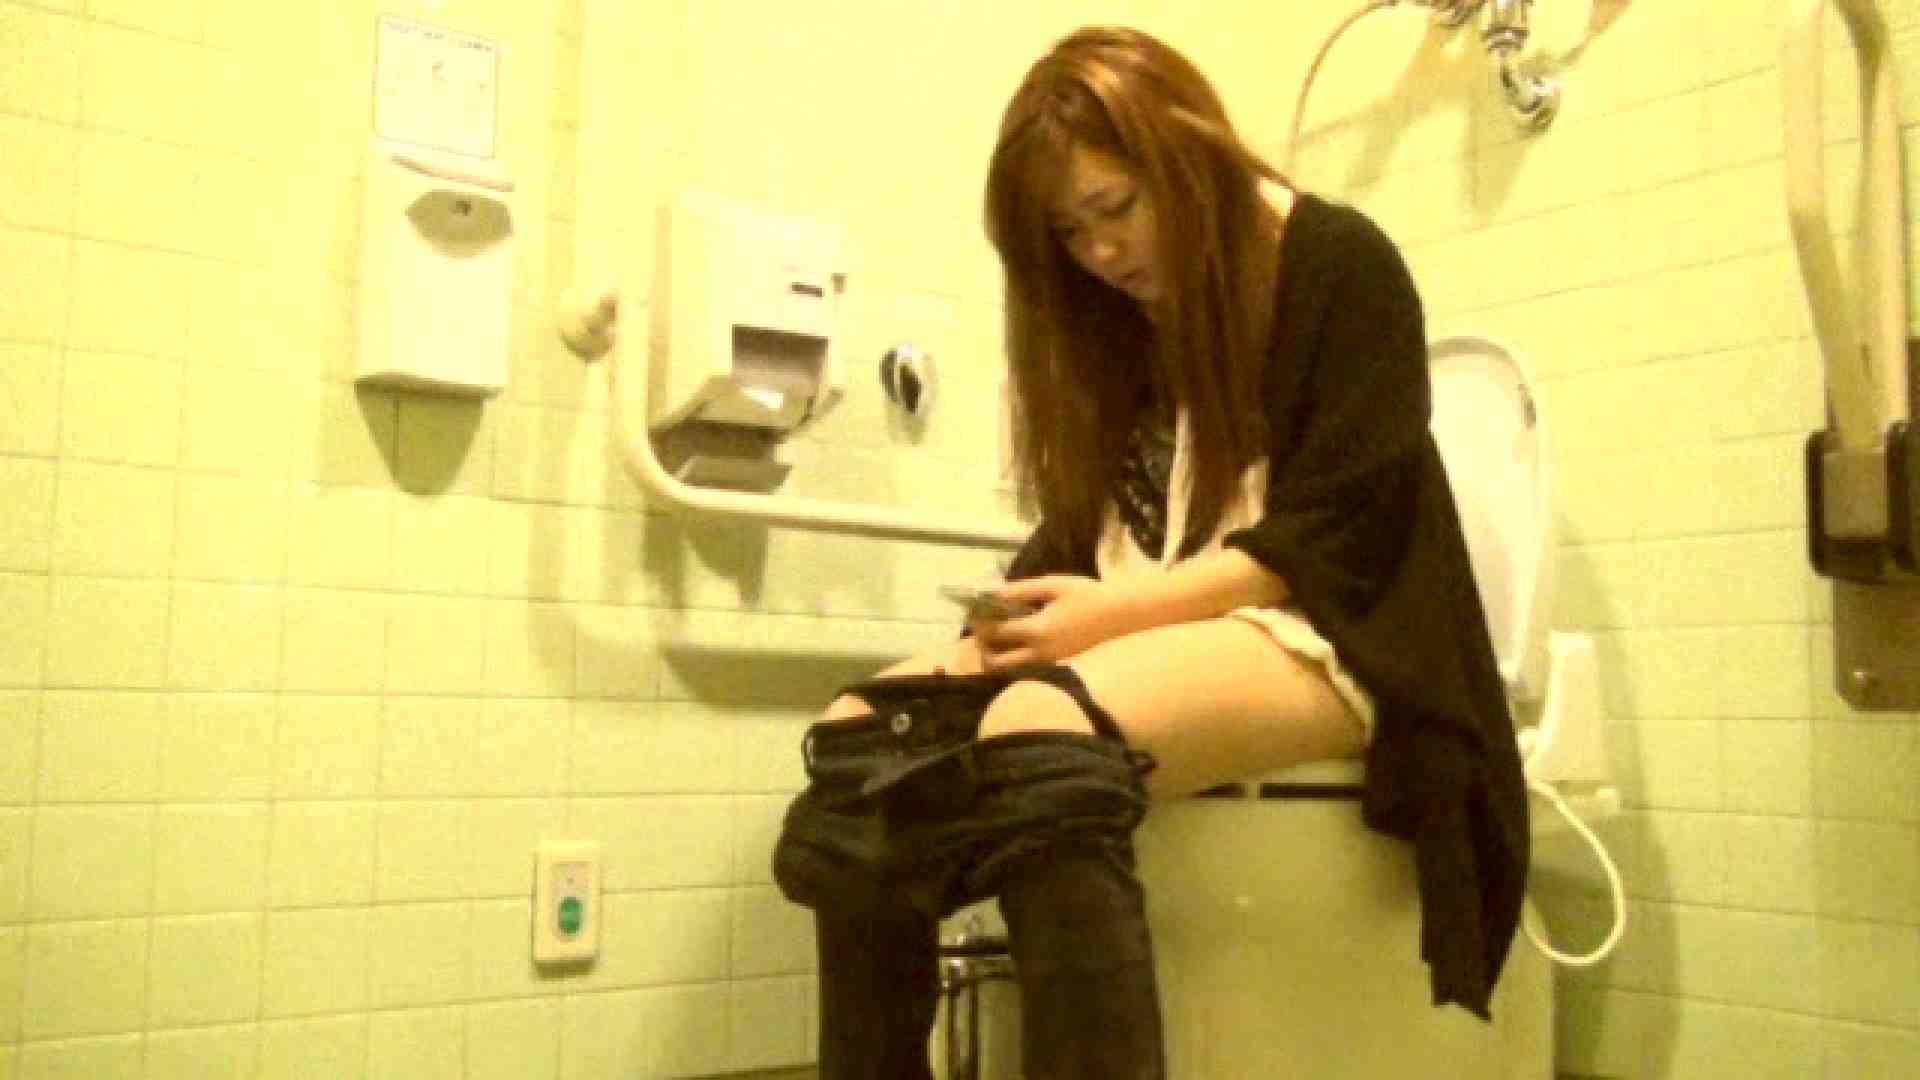 vol.26 【SKちゃん(洗面所)】ガールズバー店員 19歳 キャバ嬢   洗面所  50連発 15